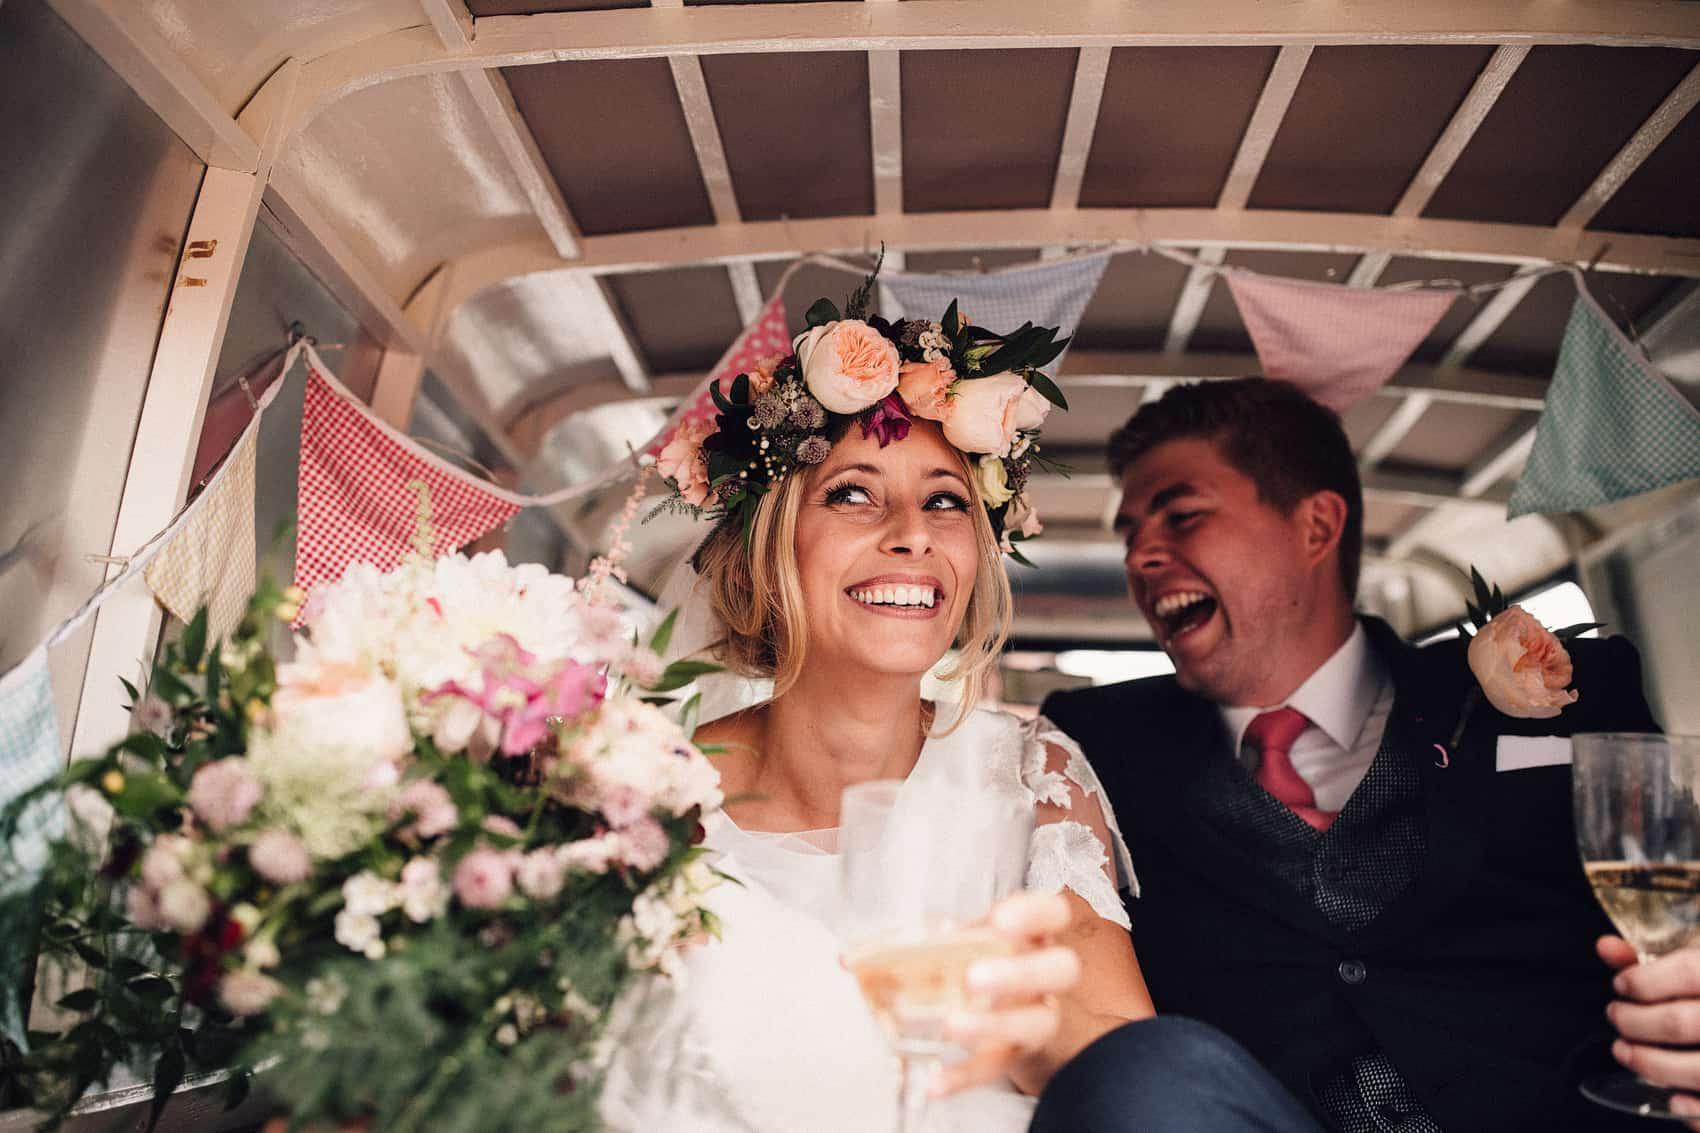 floral crown wedding ideas